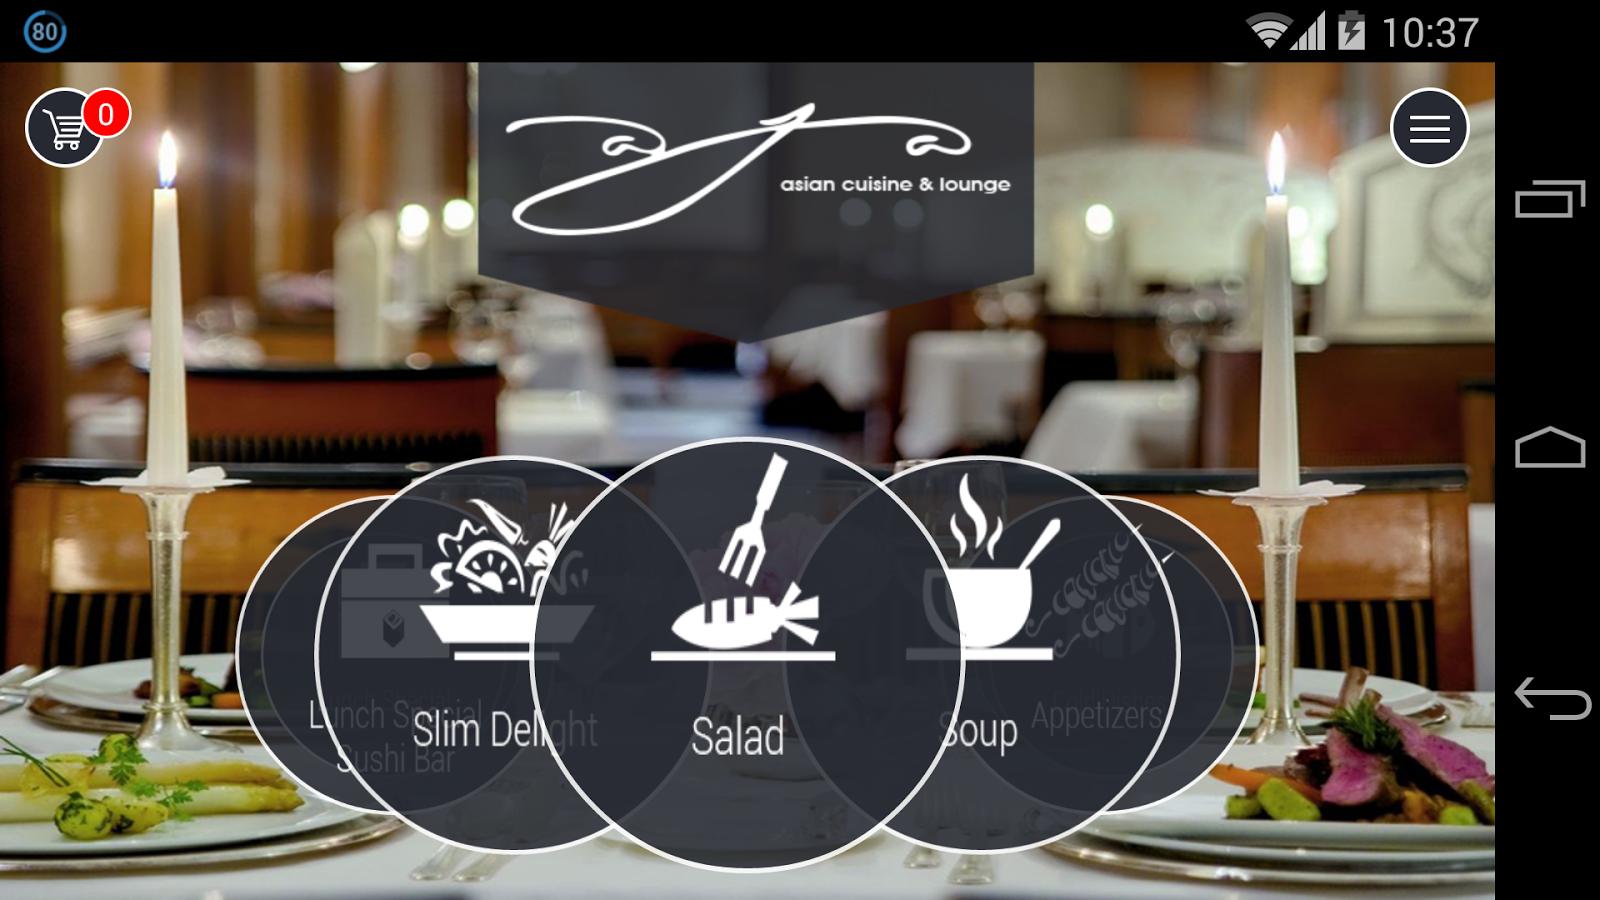 Aja asian cuisine android apps on google play for Aja asian cuisine lounge